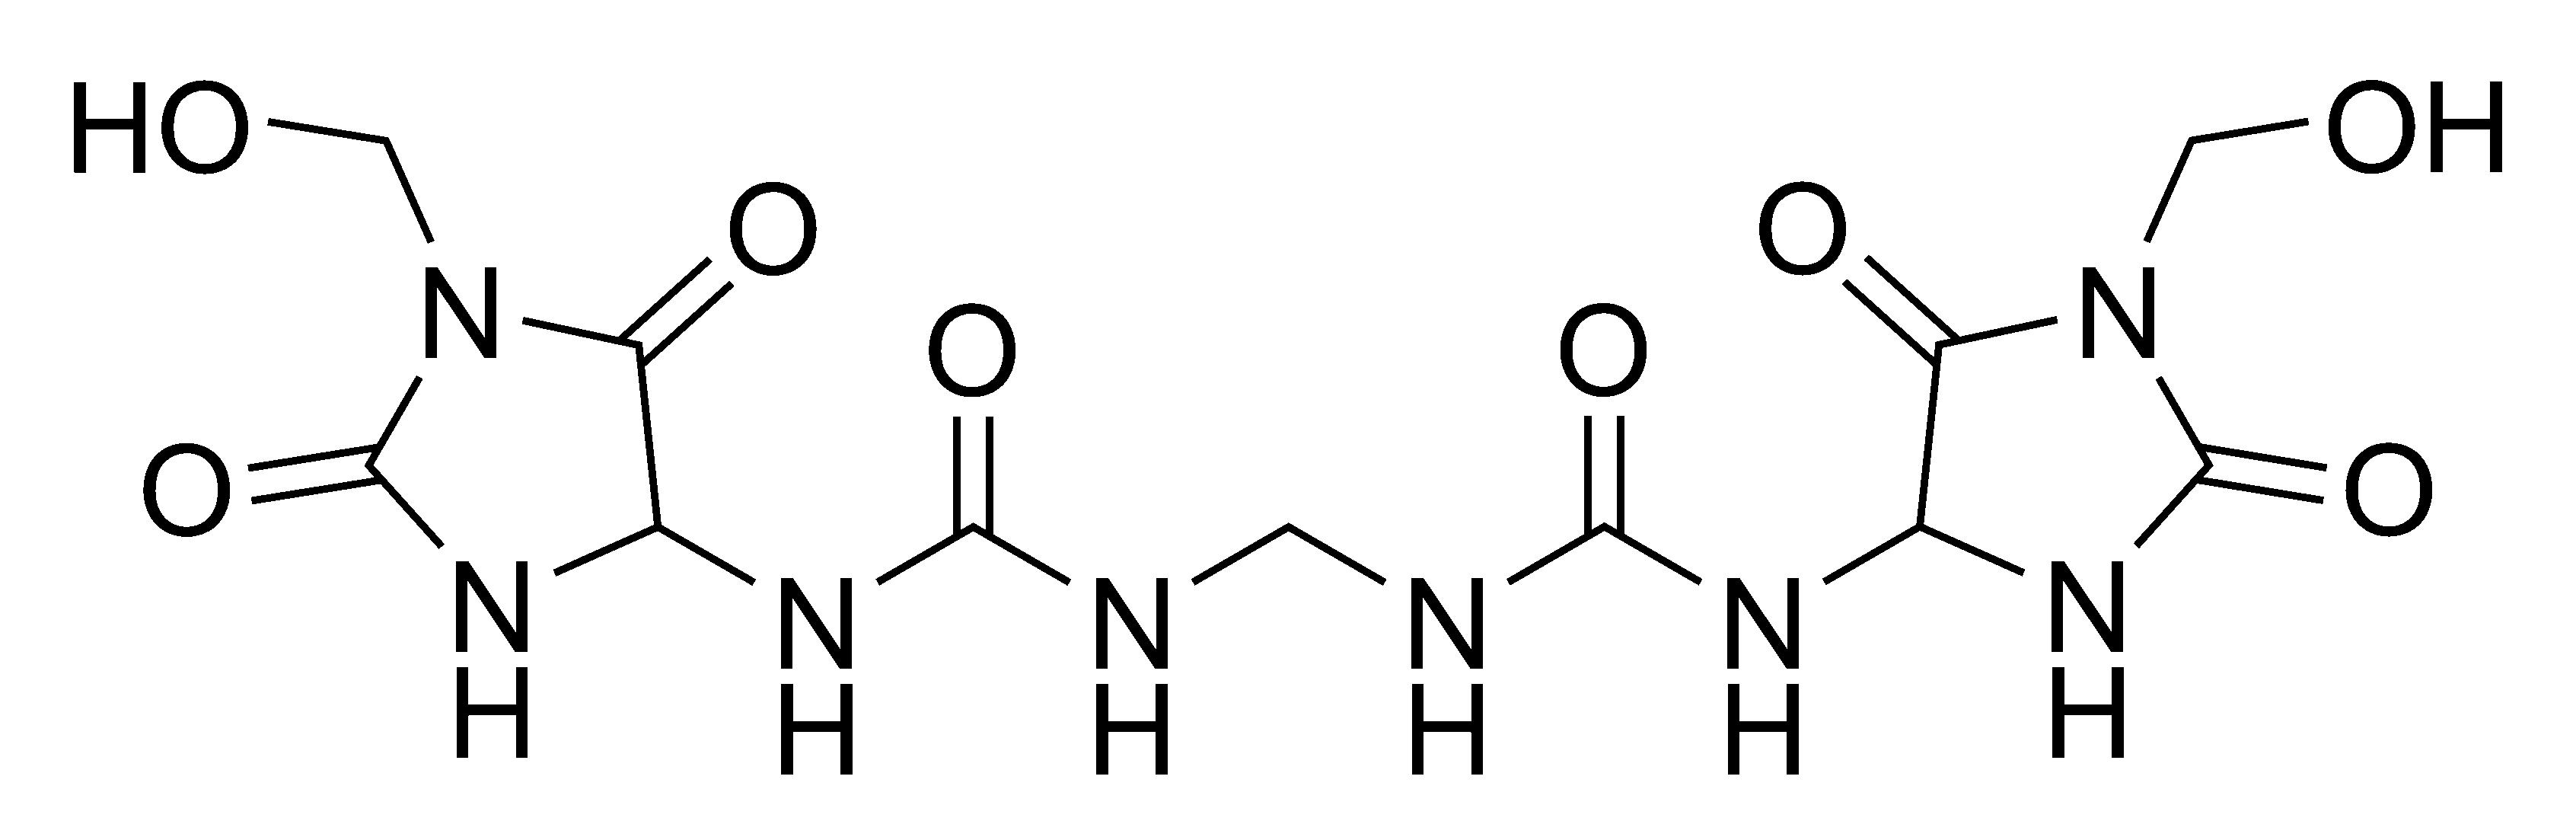 File:Imidazolidinyl urea erroneous formula.png - Wikimedia Commons